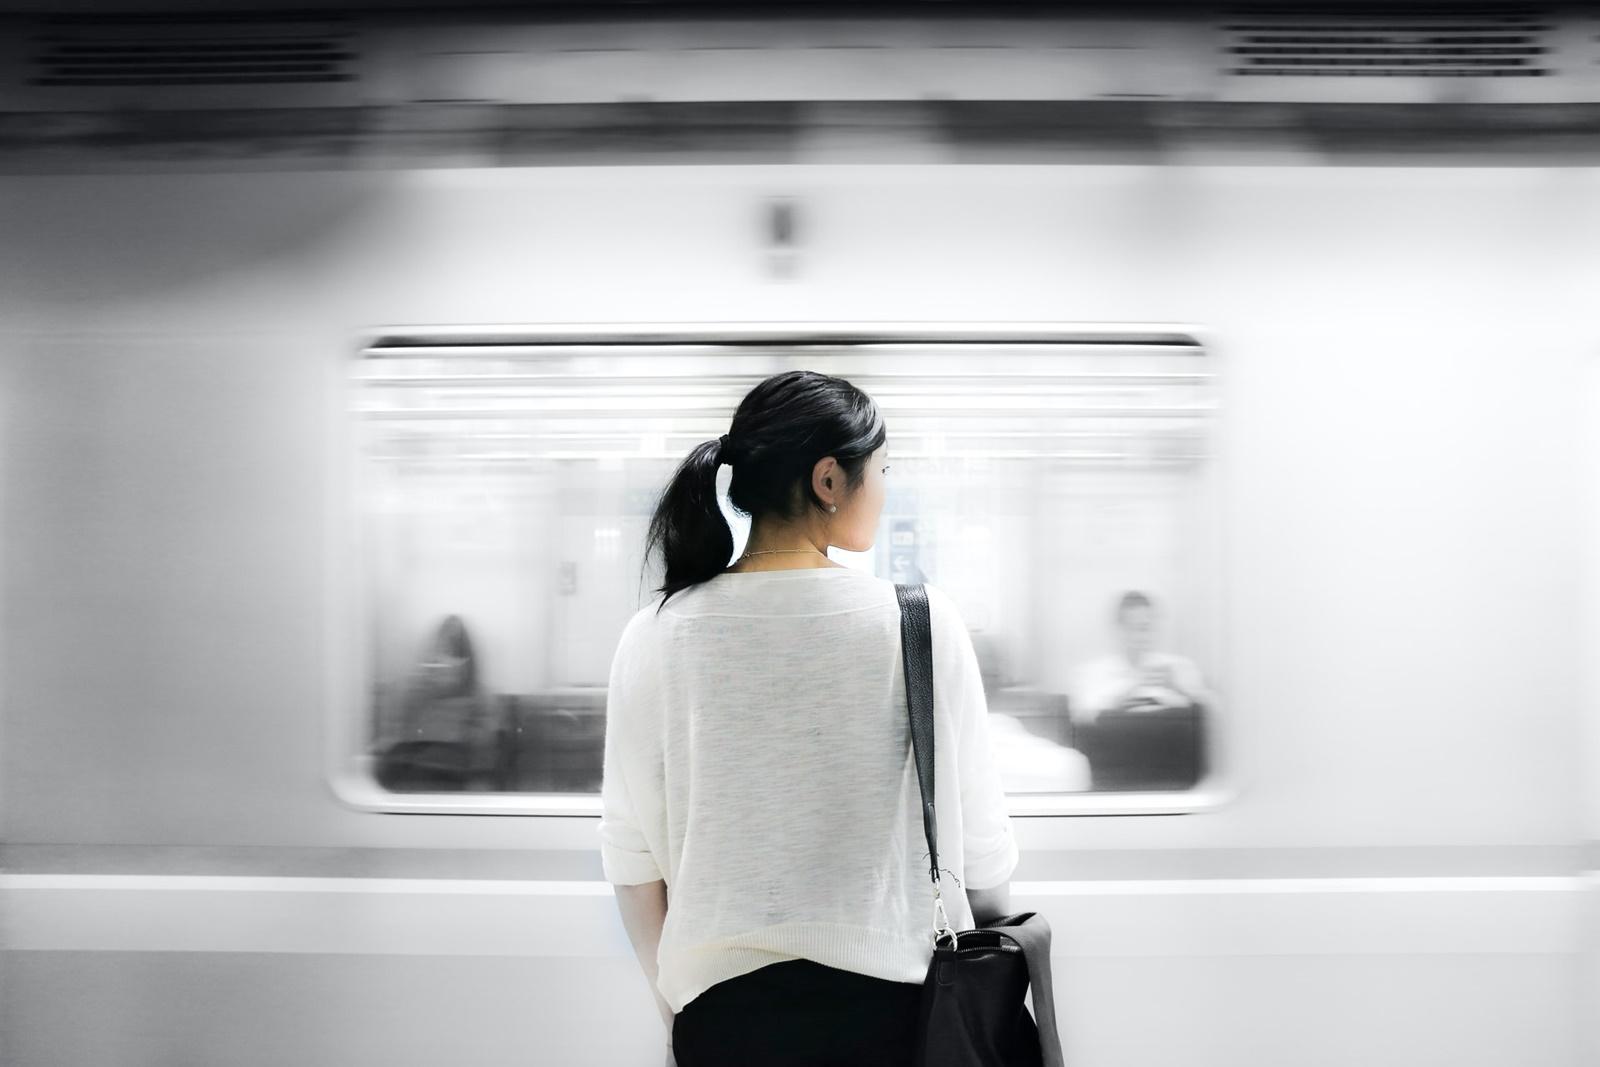 電車 一目惚れ 社会人 画像